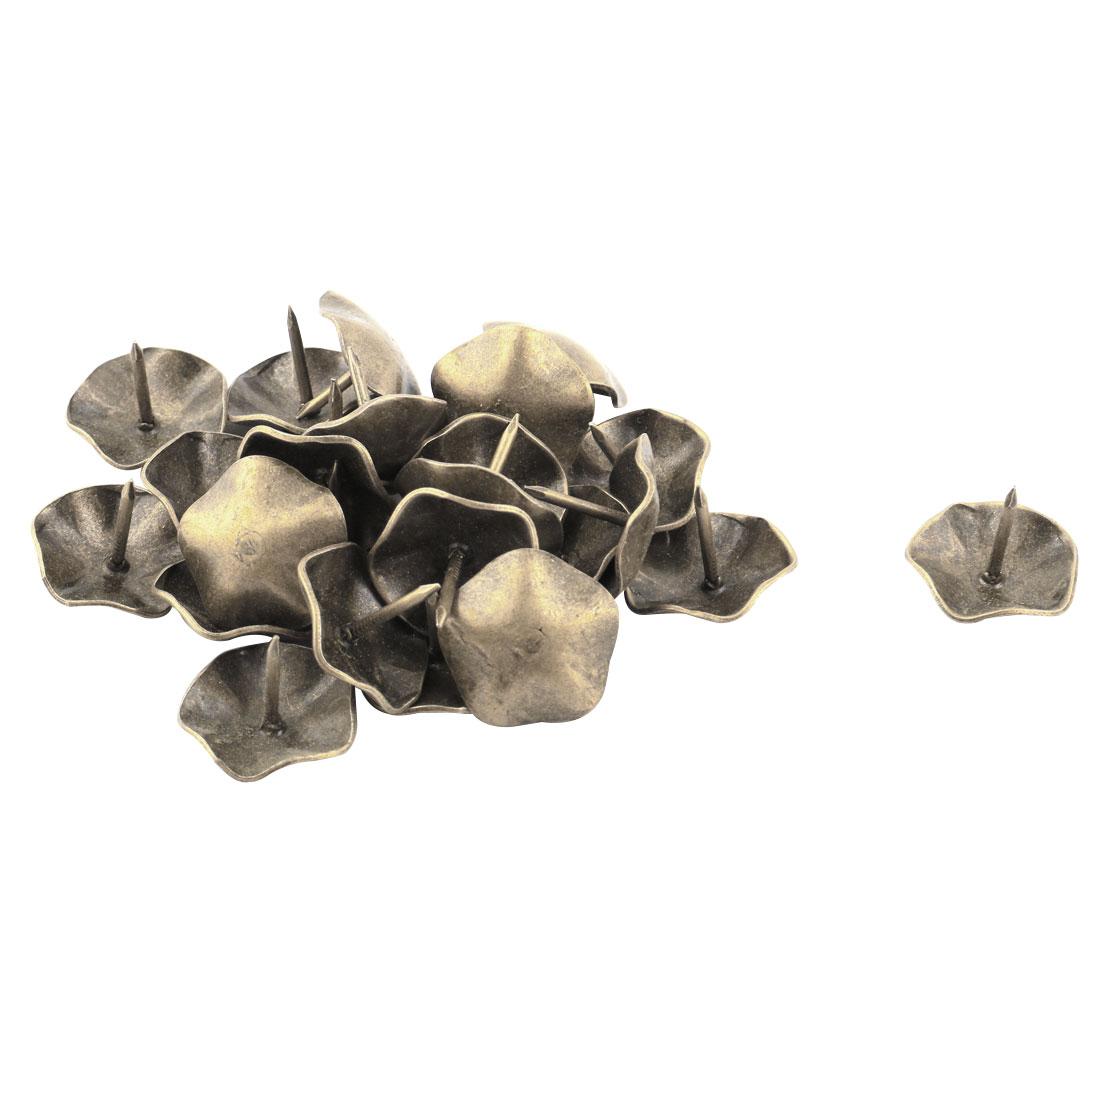 Furniture Accessory Metal Flower Designed Pushpin Tack Nail Bronze Tone 25pcs